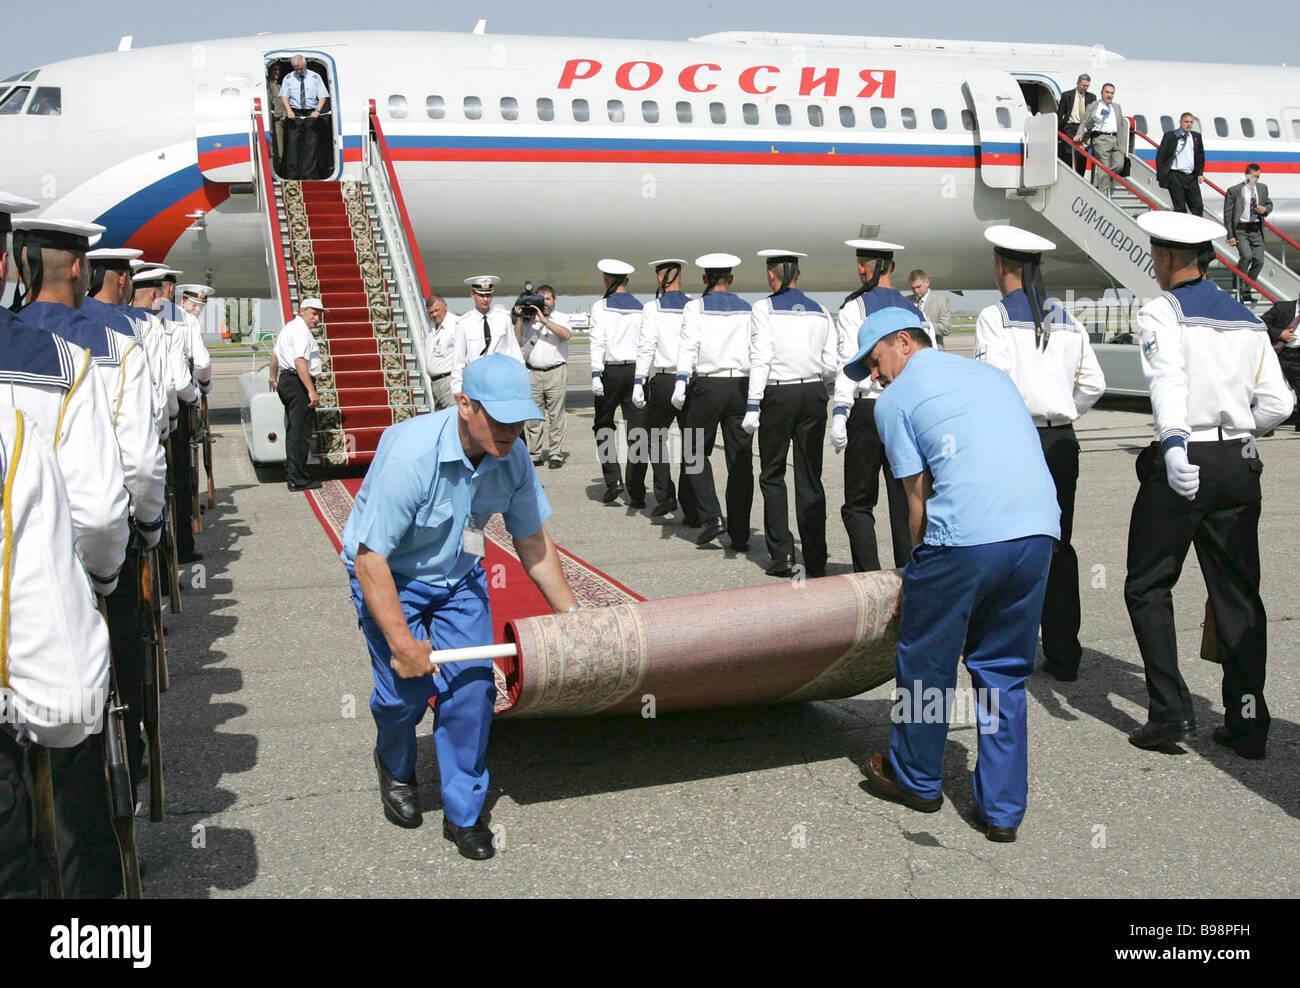 Preparing to meet Russian Prime Minister Mikhail Fradkov in the Crimea - Stock Image